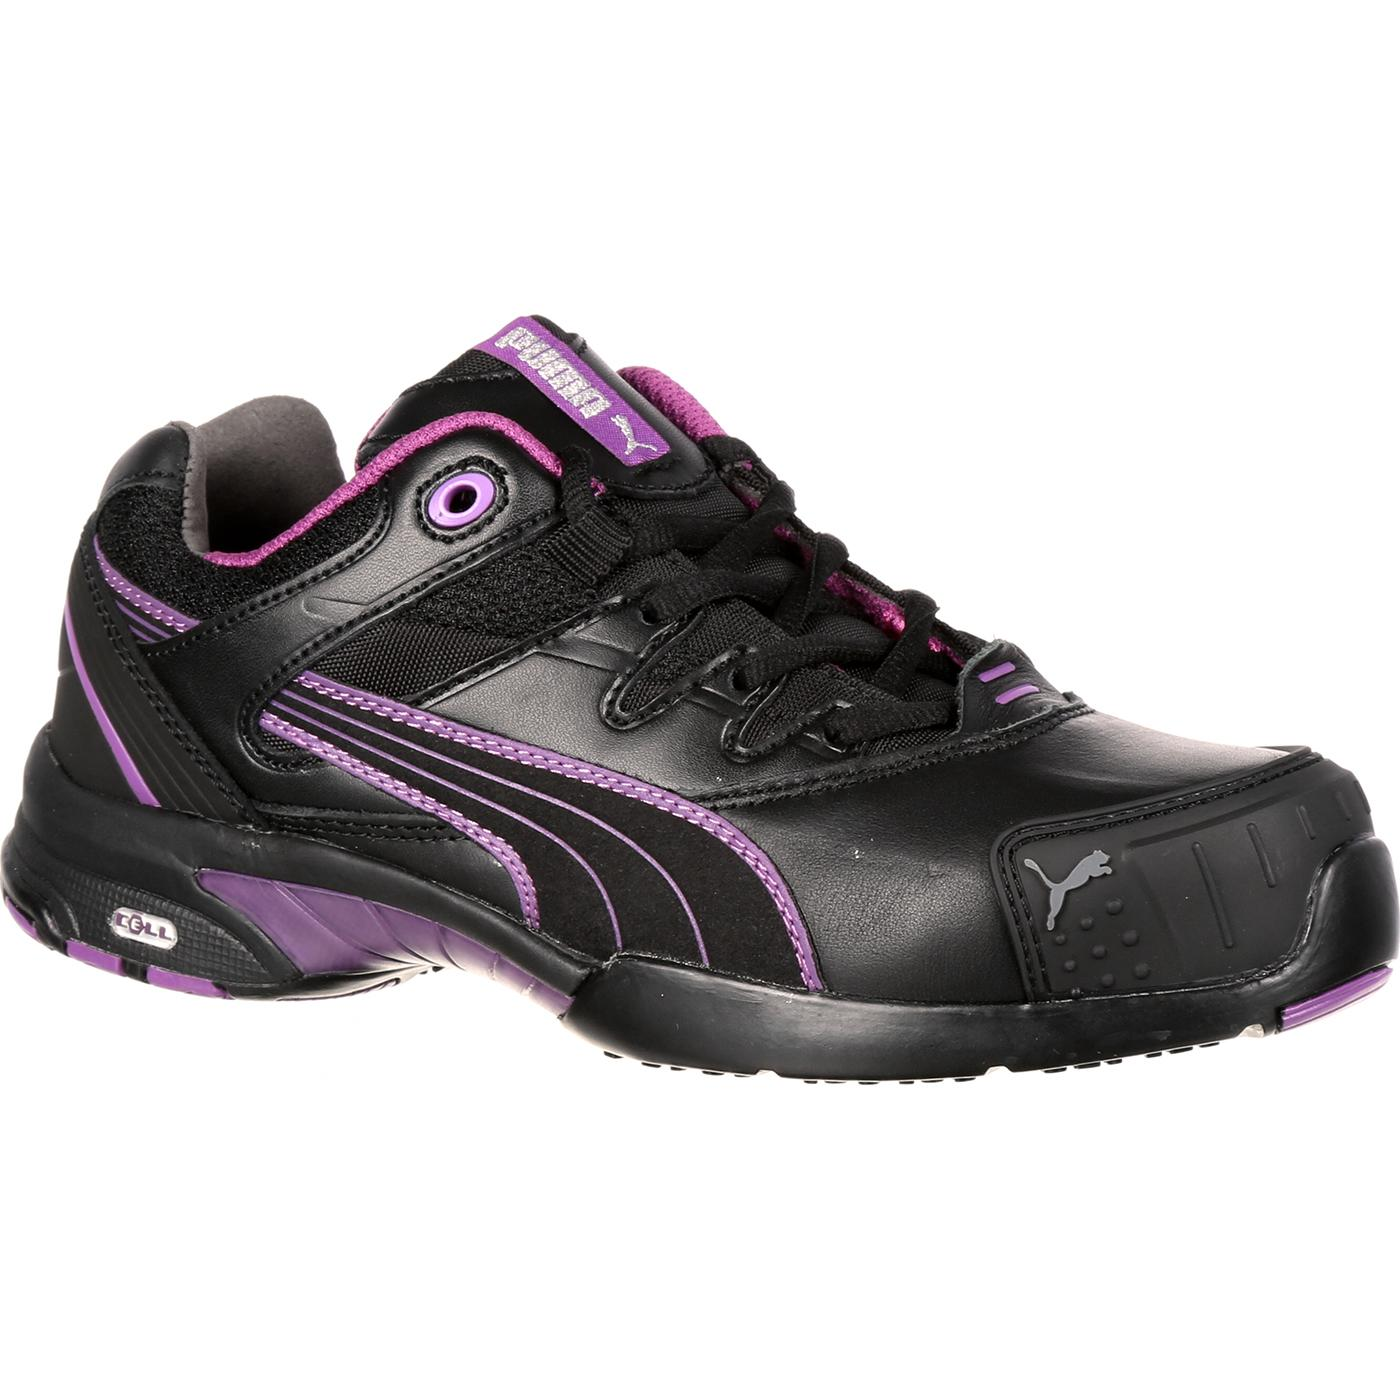 Converse Steel Toe Shoes Australia